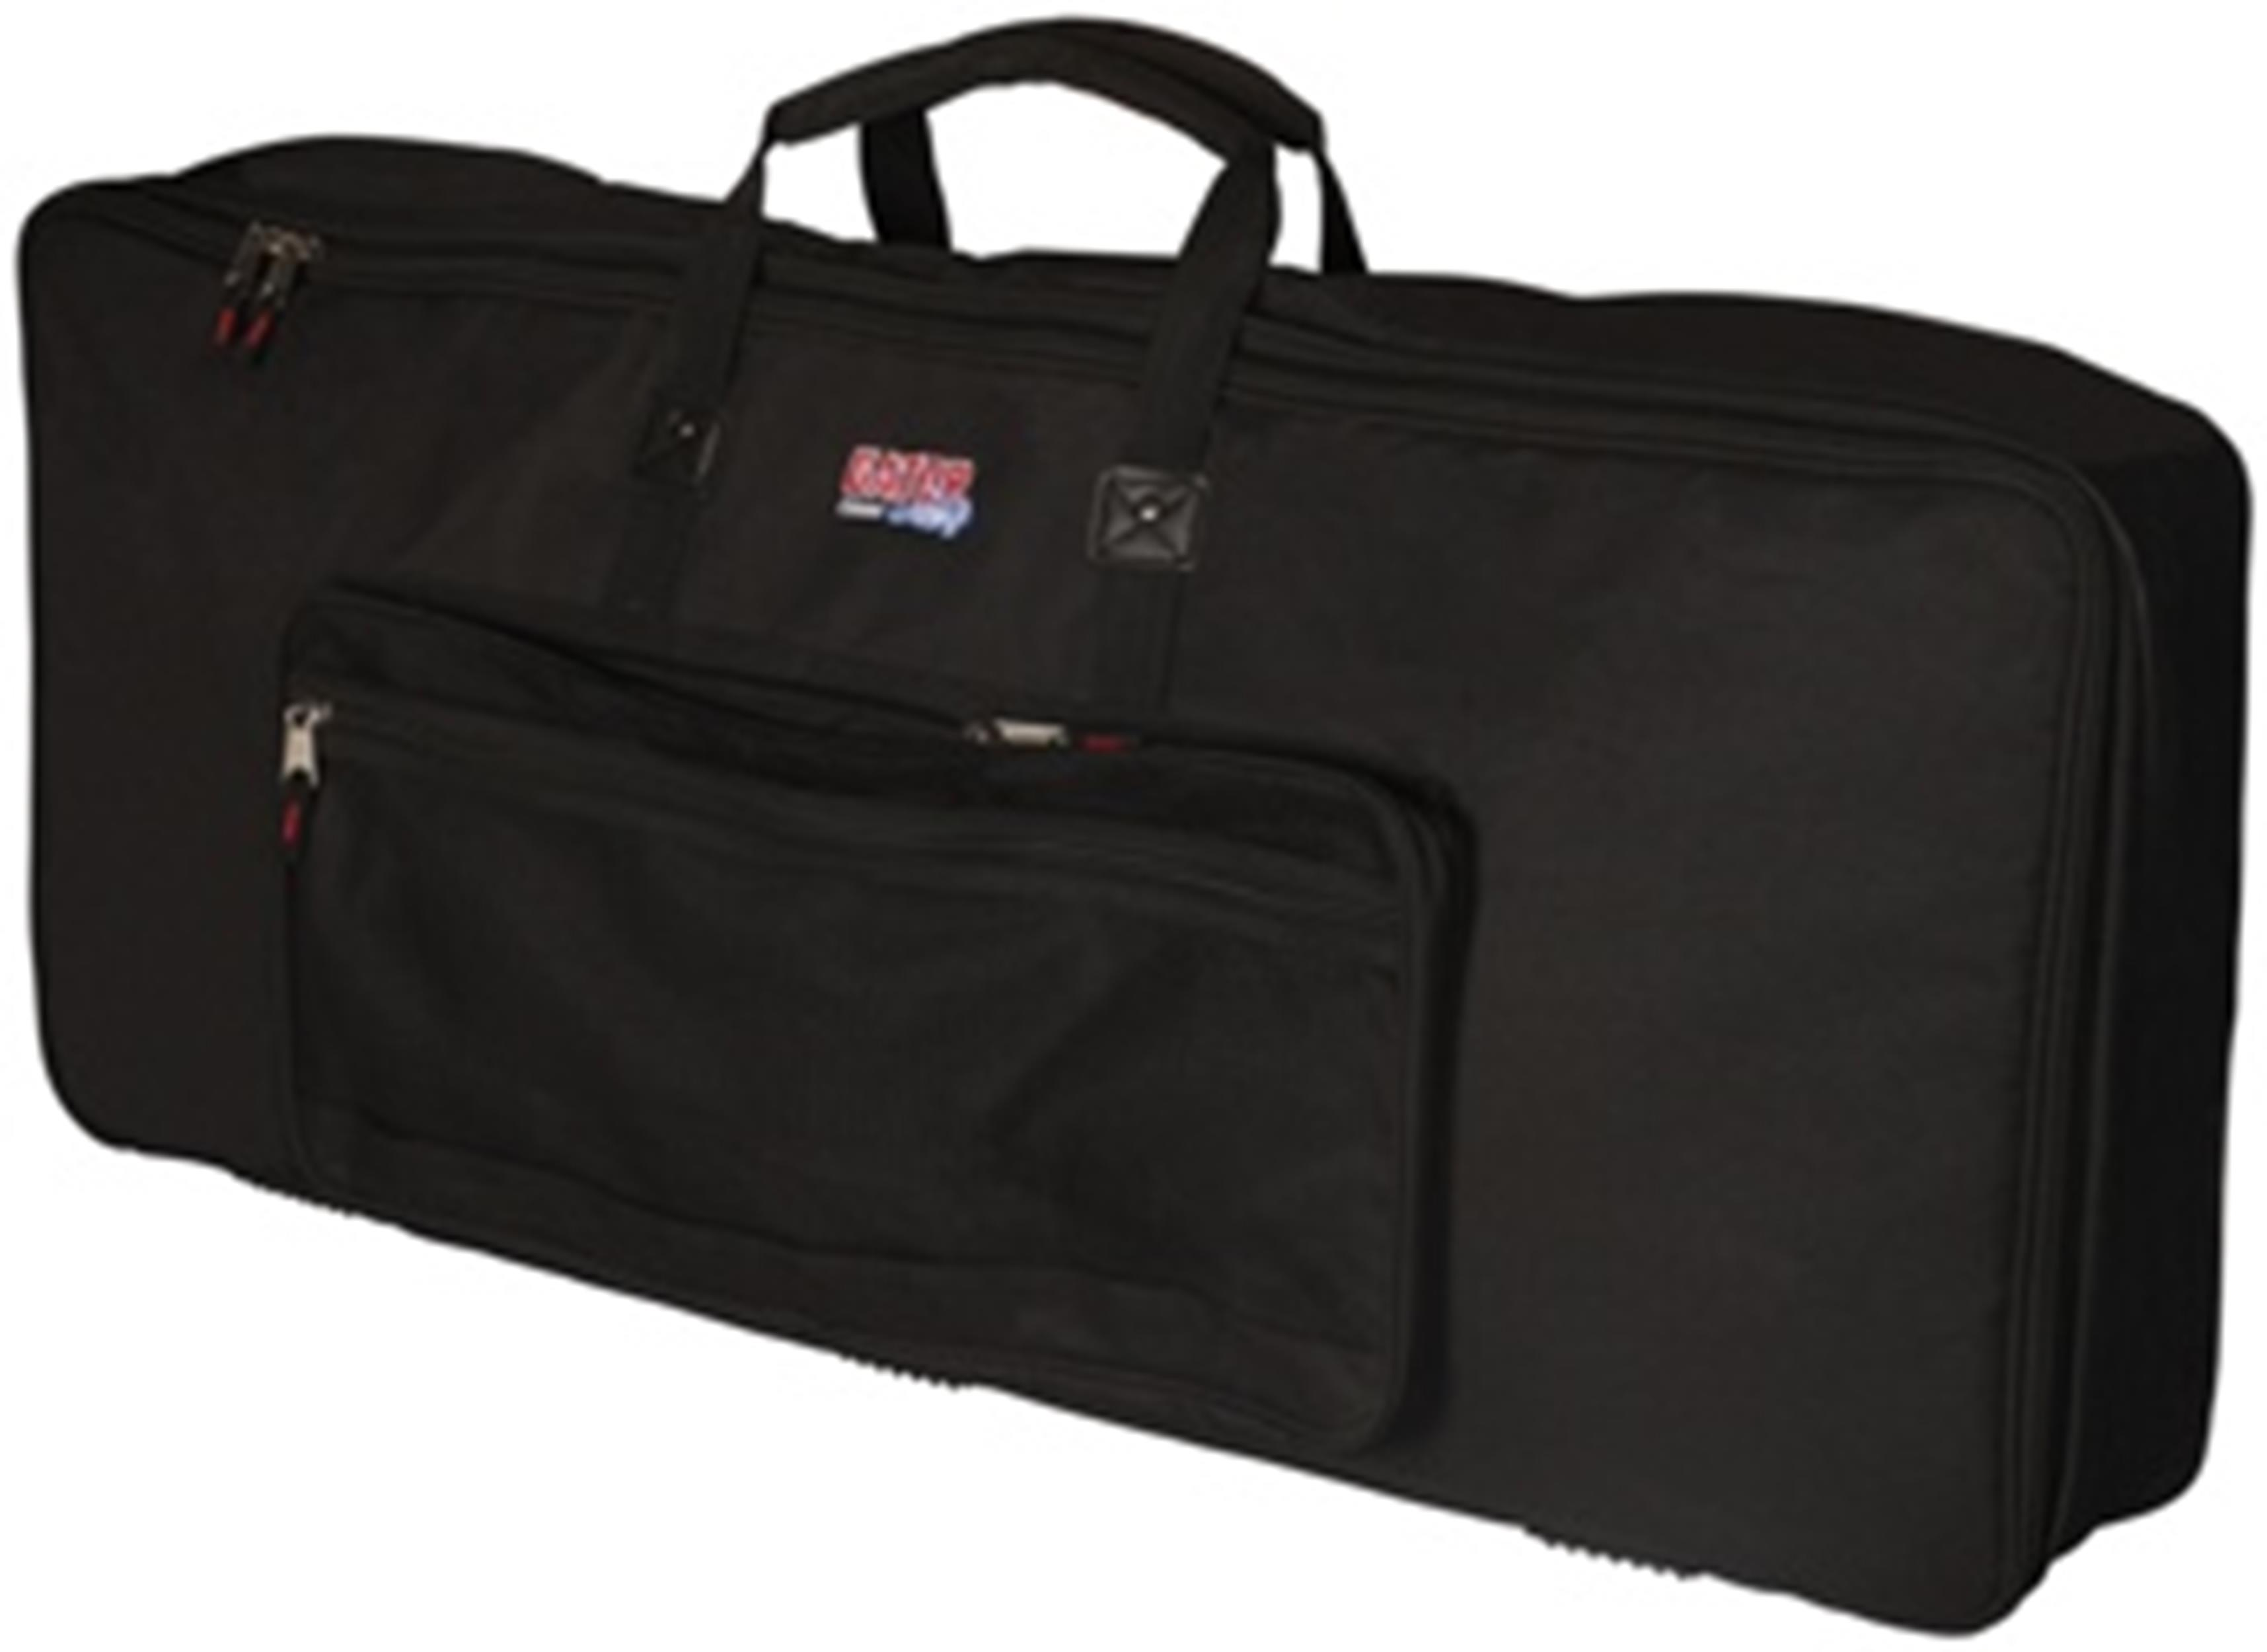 Gator-Cases-GKB-61-SLIM-borsa-ultra-sottile-per-tastiera-61-tasti-sku-2758739422006